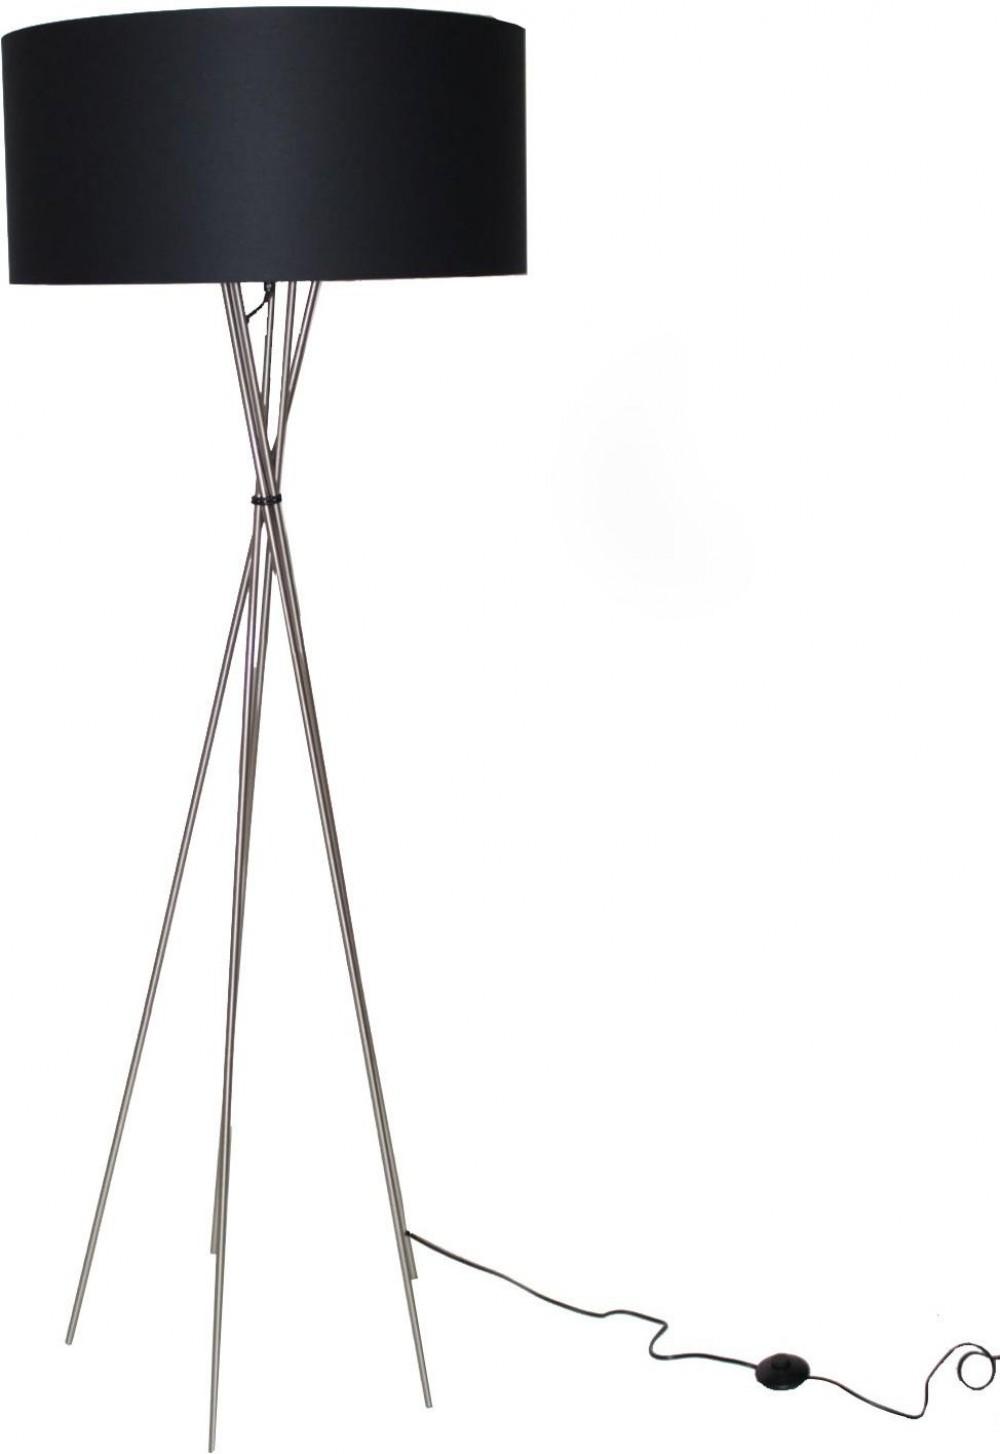 stehleuchte moderne stehlampe mit einem lampenschirm h he 145 cm. Black Bedroom Furniture Sets. Home Design Ideas